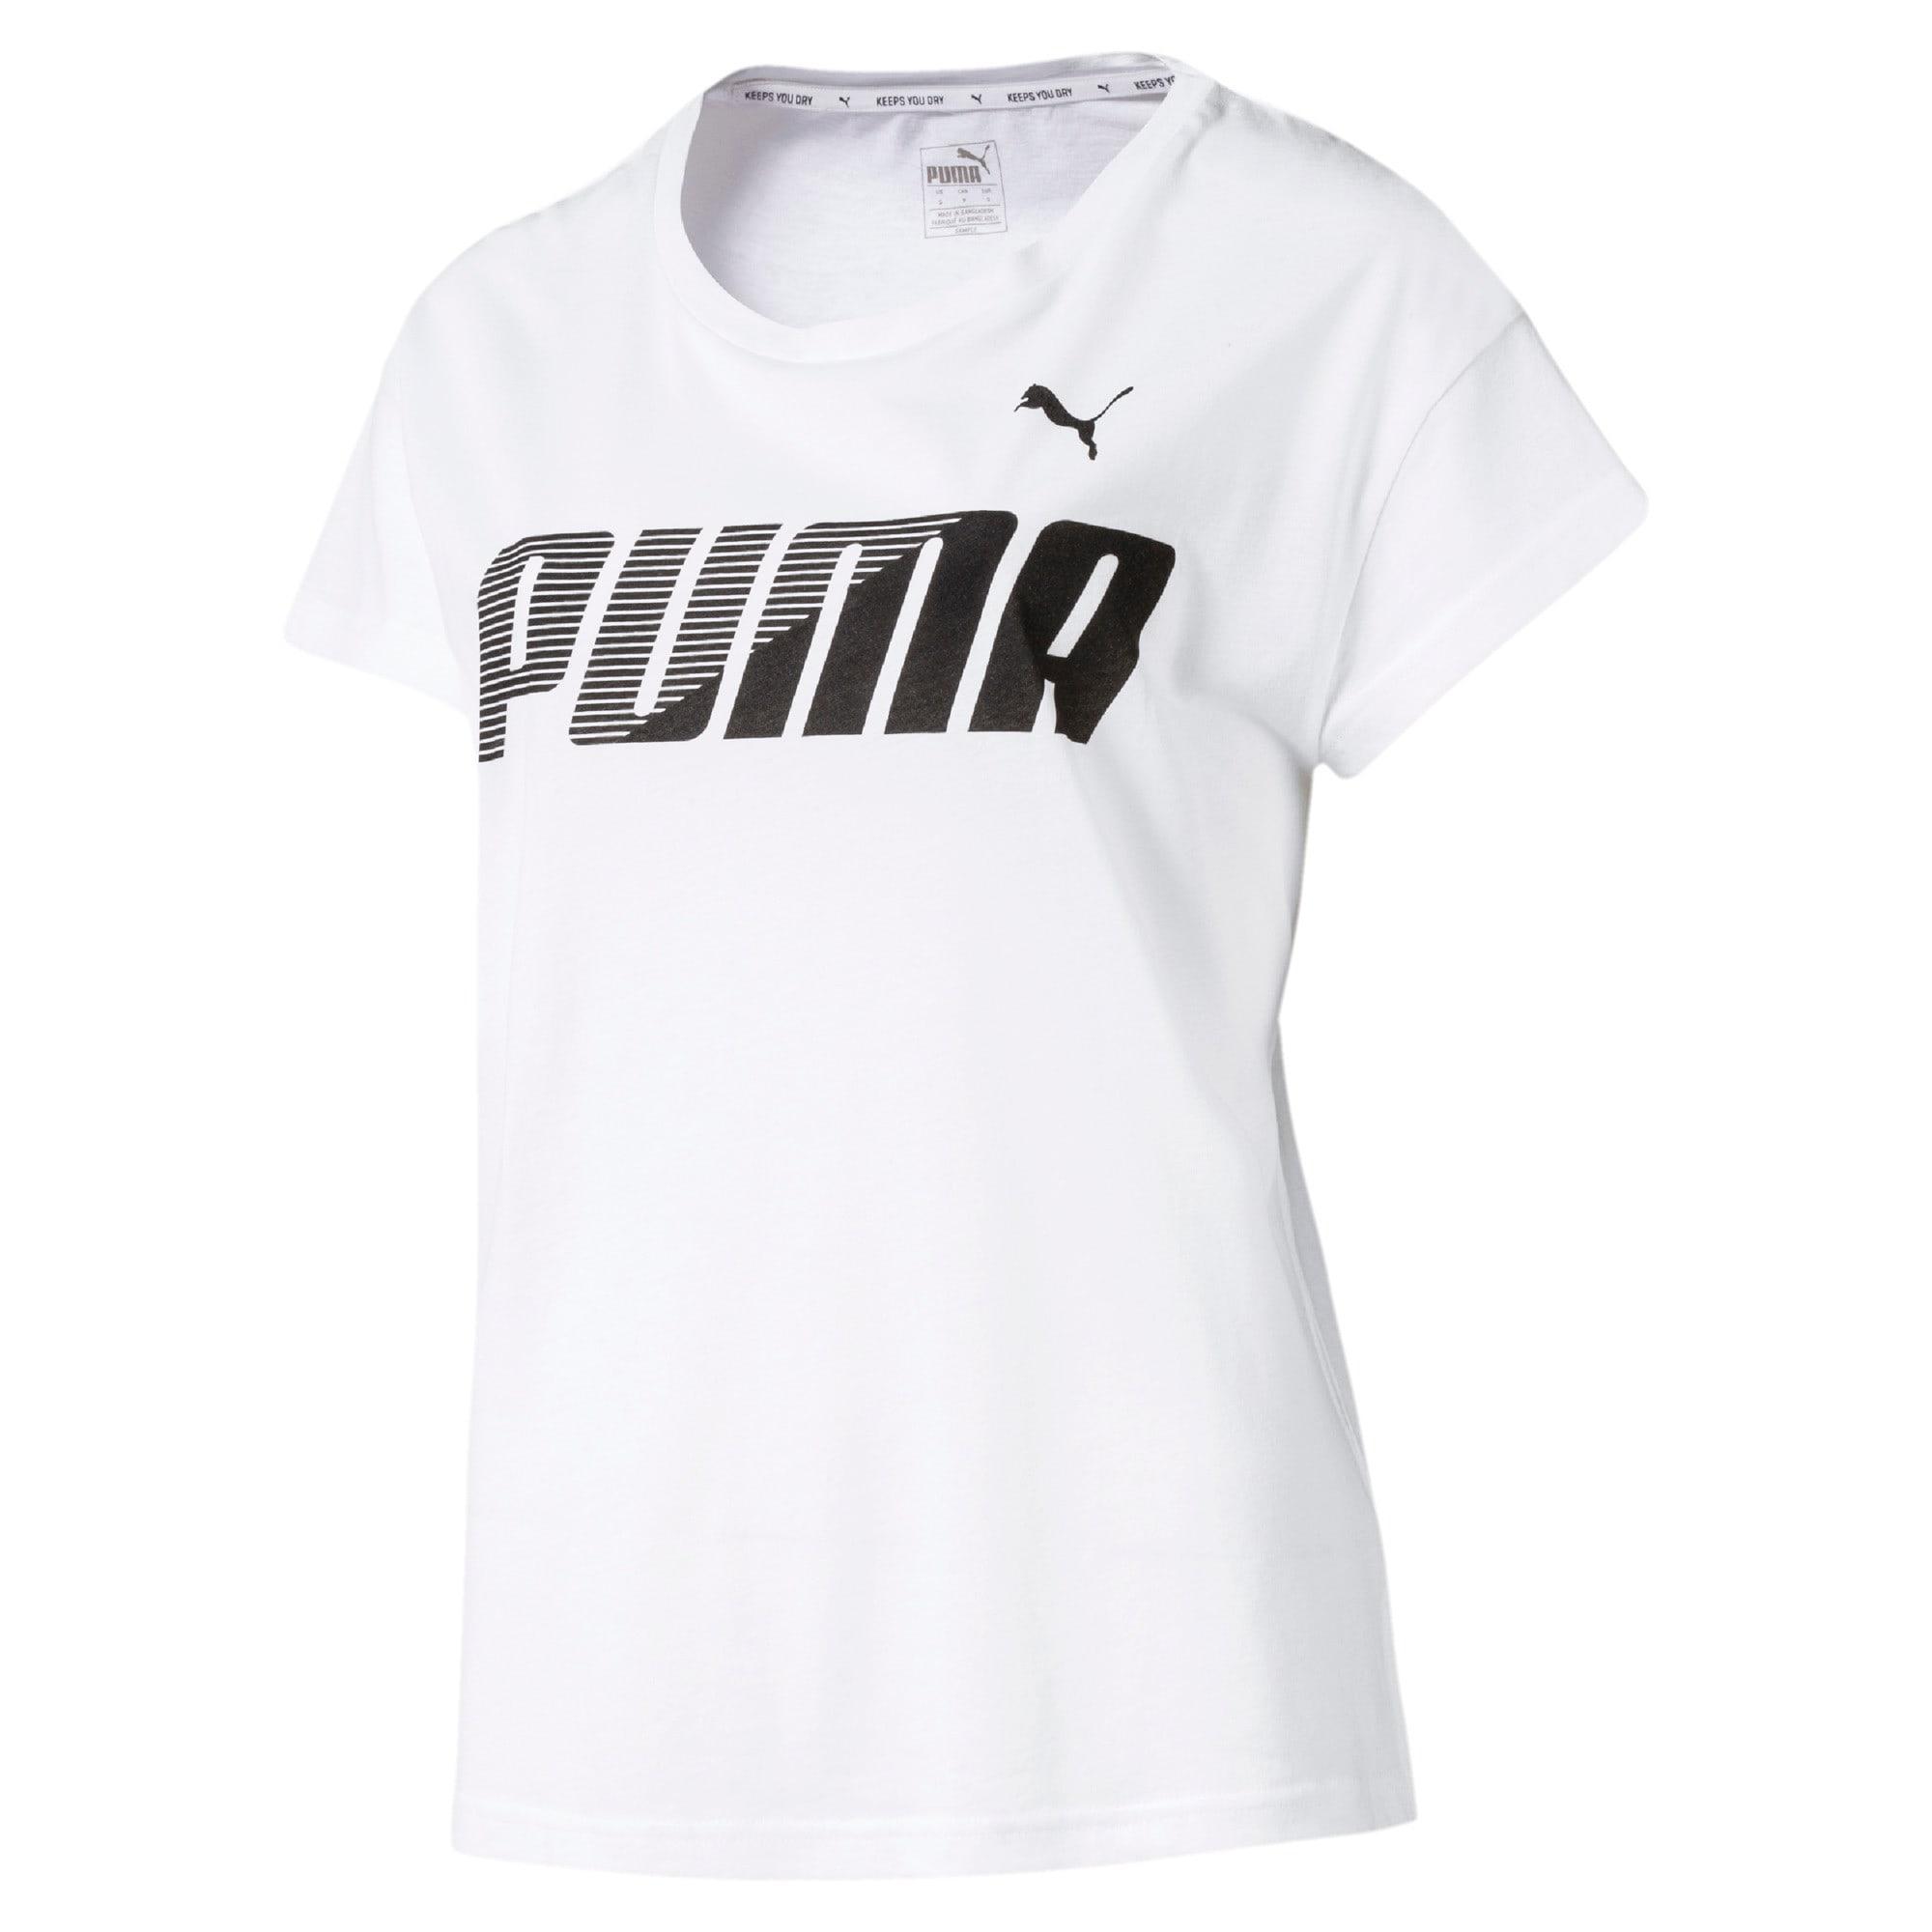 Miniatura 4 de Camiseta estampadaModernSports de mujer, Puma White, mediano